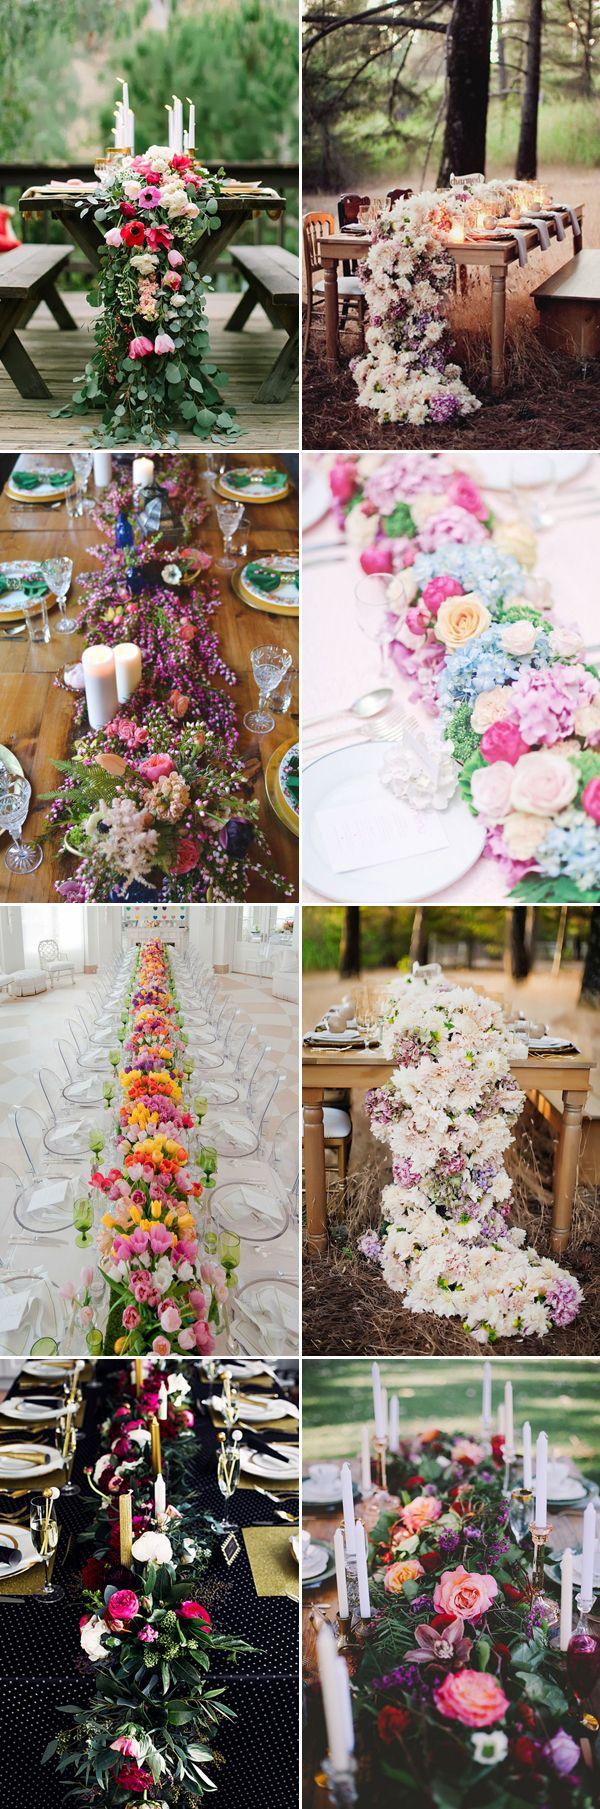 25 Statement-making Fresh Flower Table Runners!